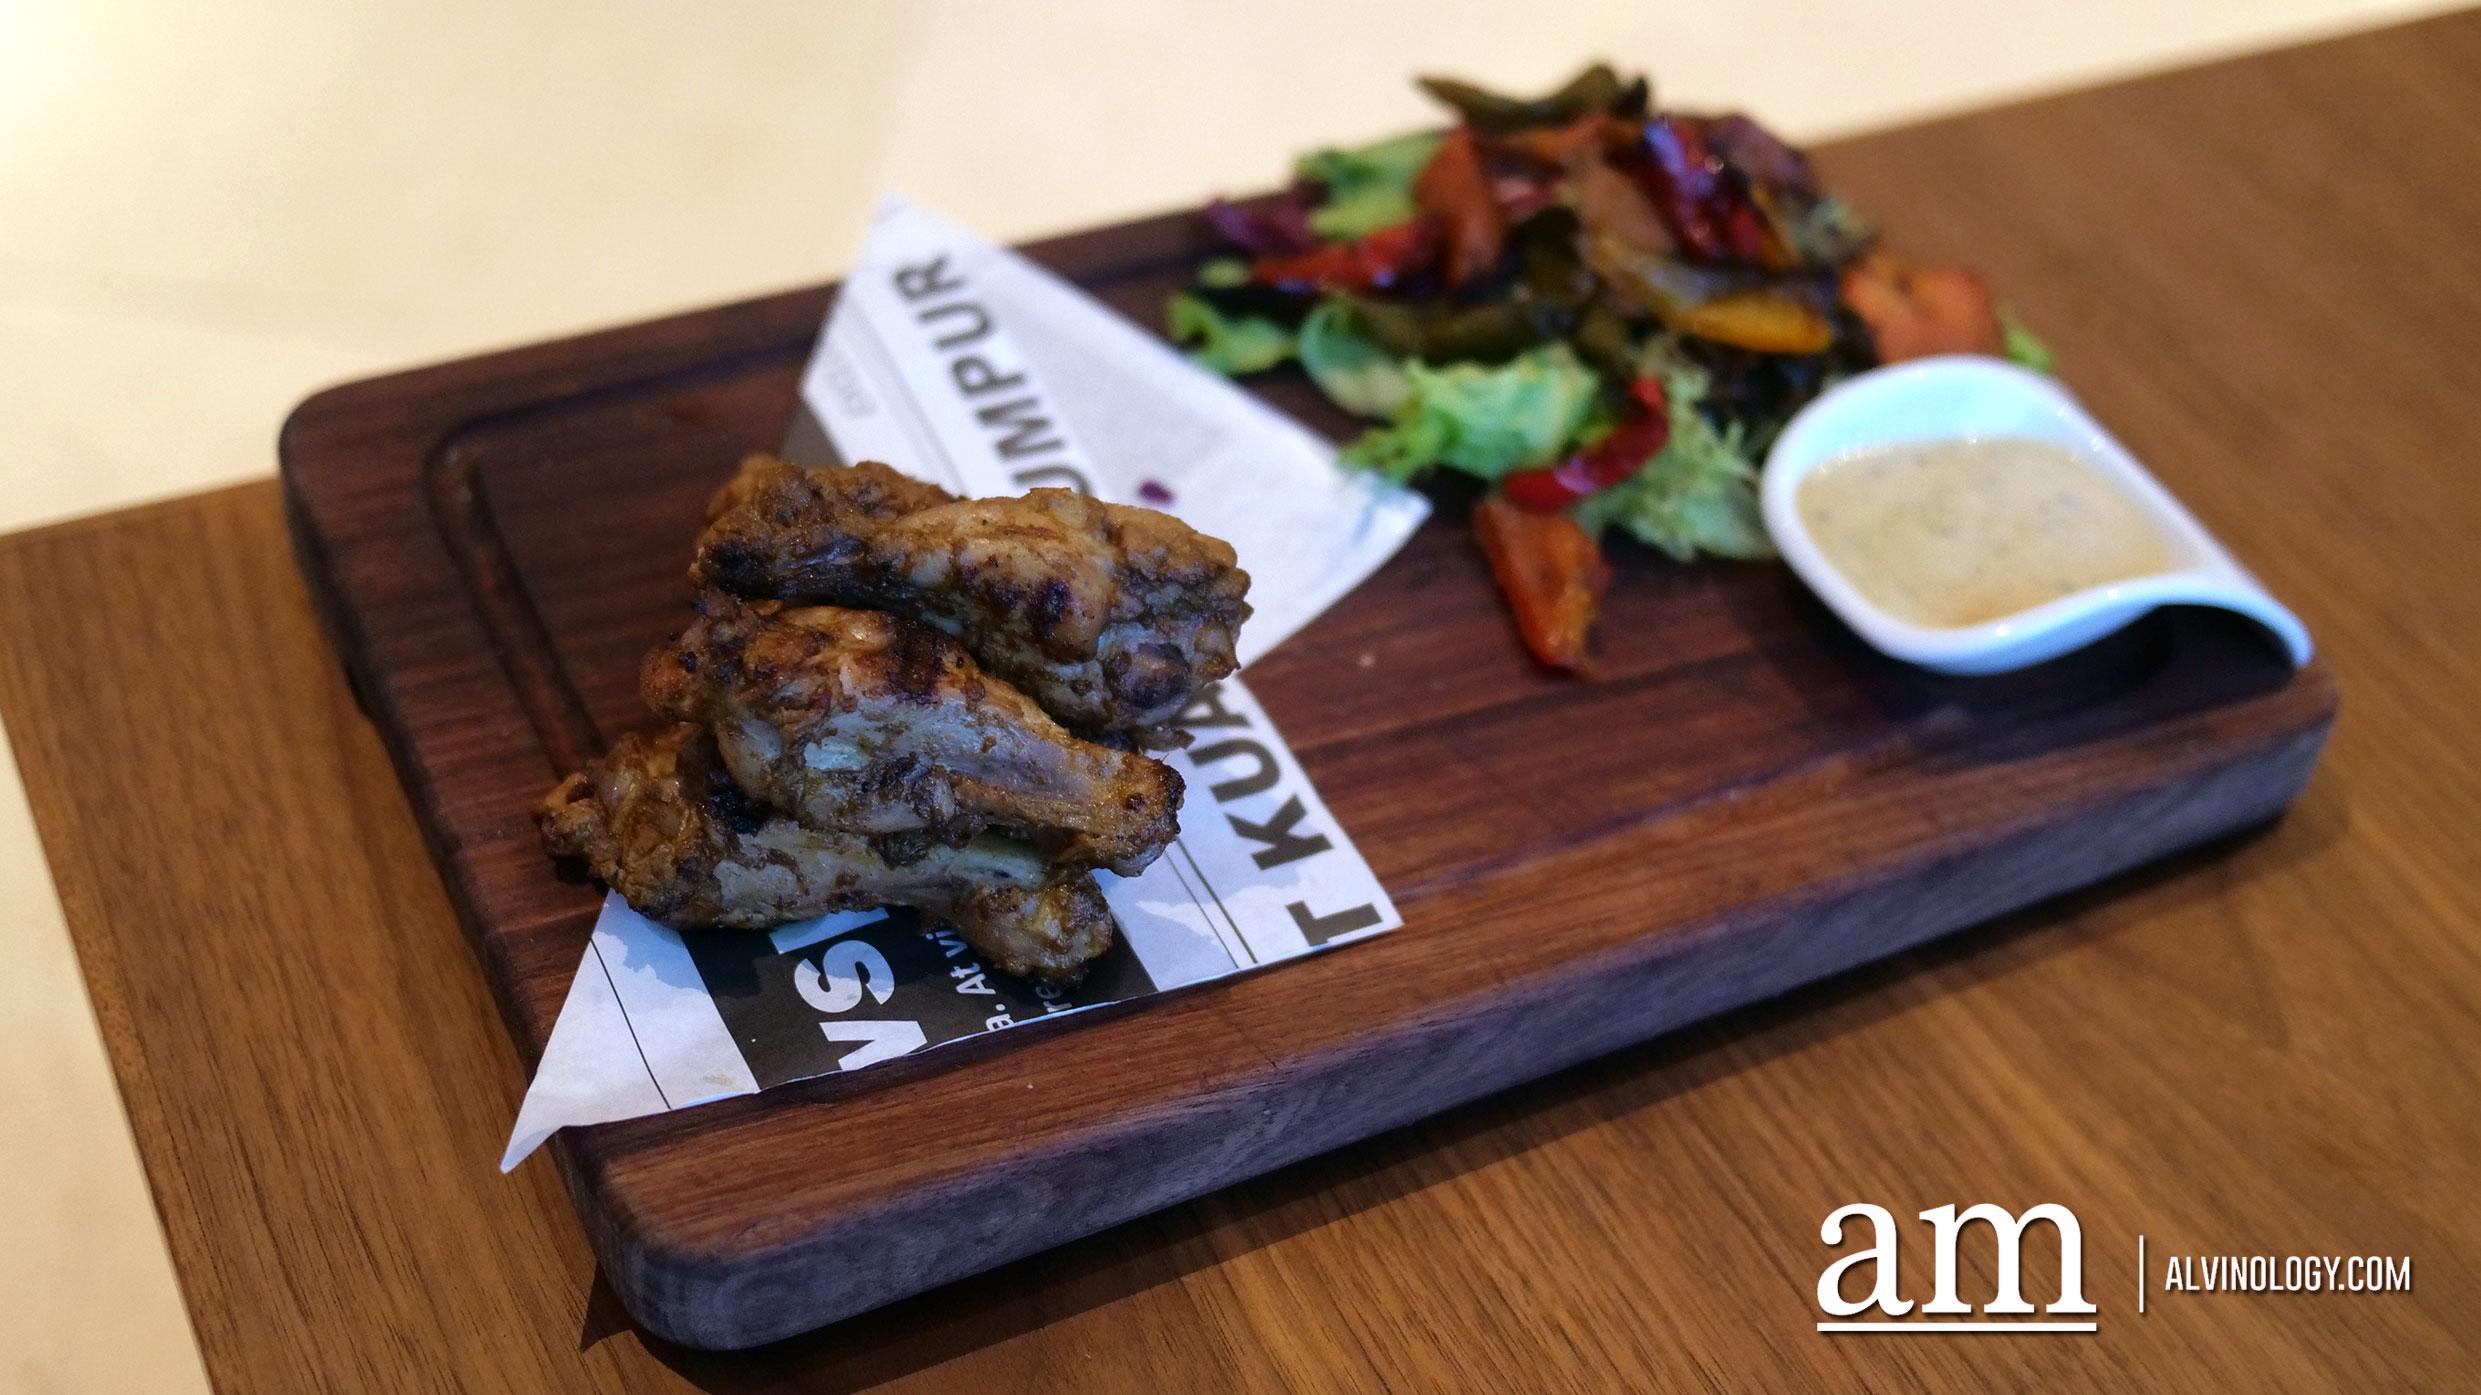 Hot & Spicy Buffalo Chicken (RM38) - Spicy peri-peri glaze, Stilton cheese dressing, warm roasted vegetable salad